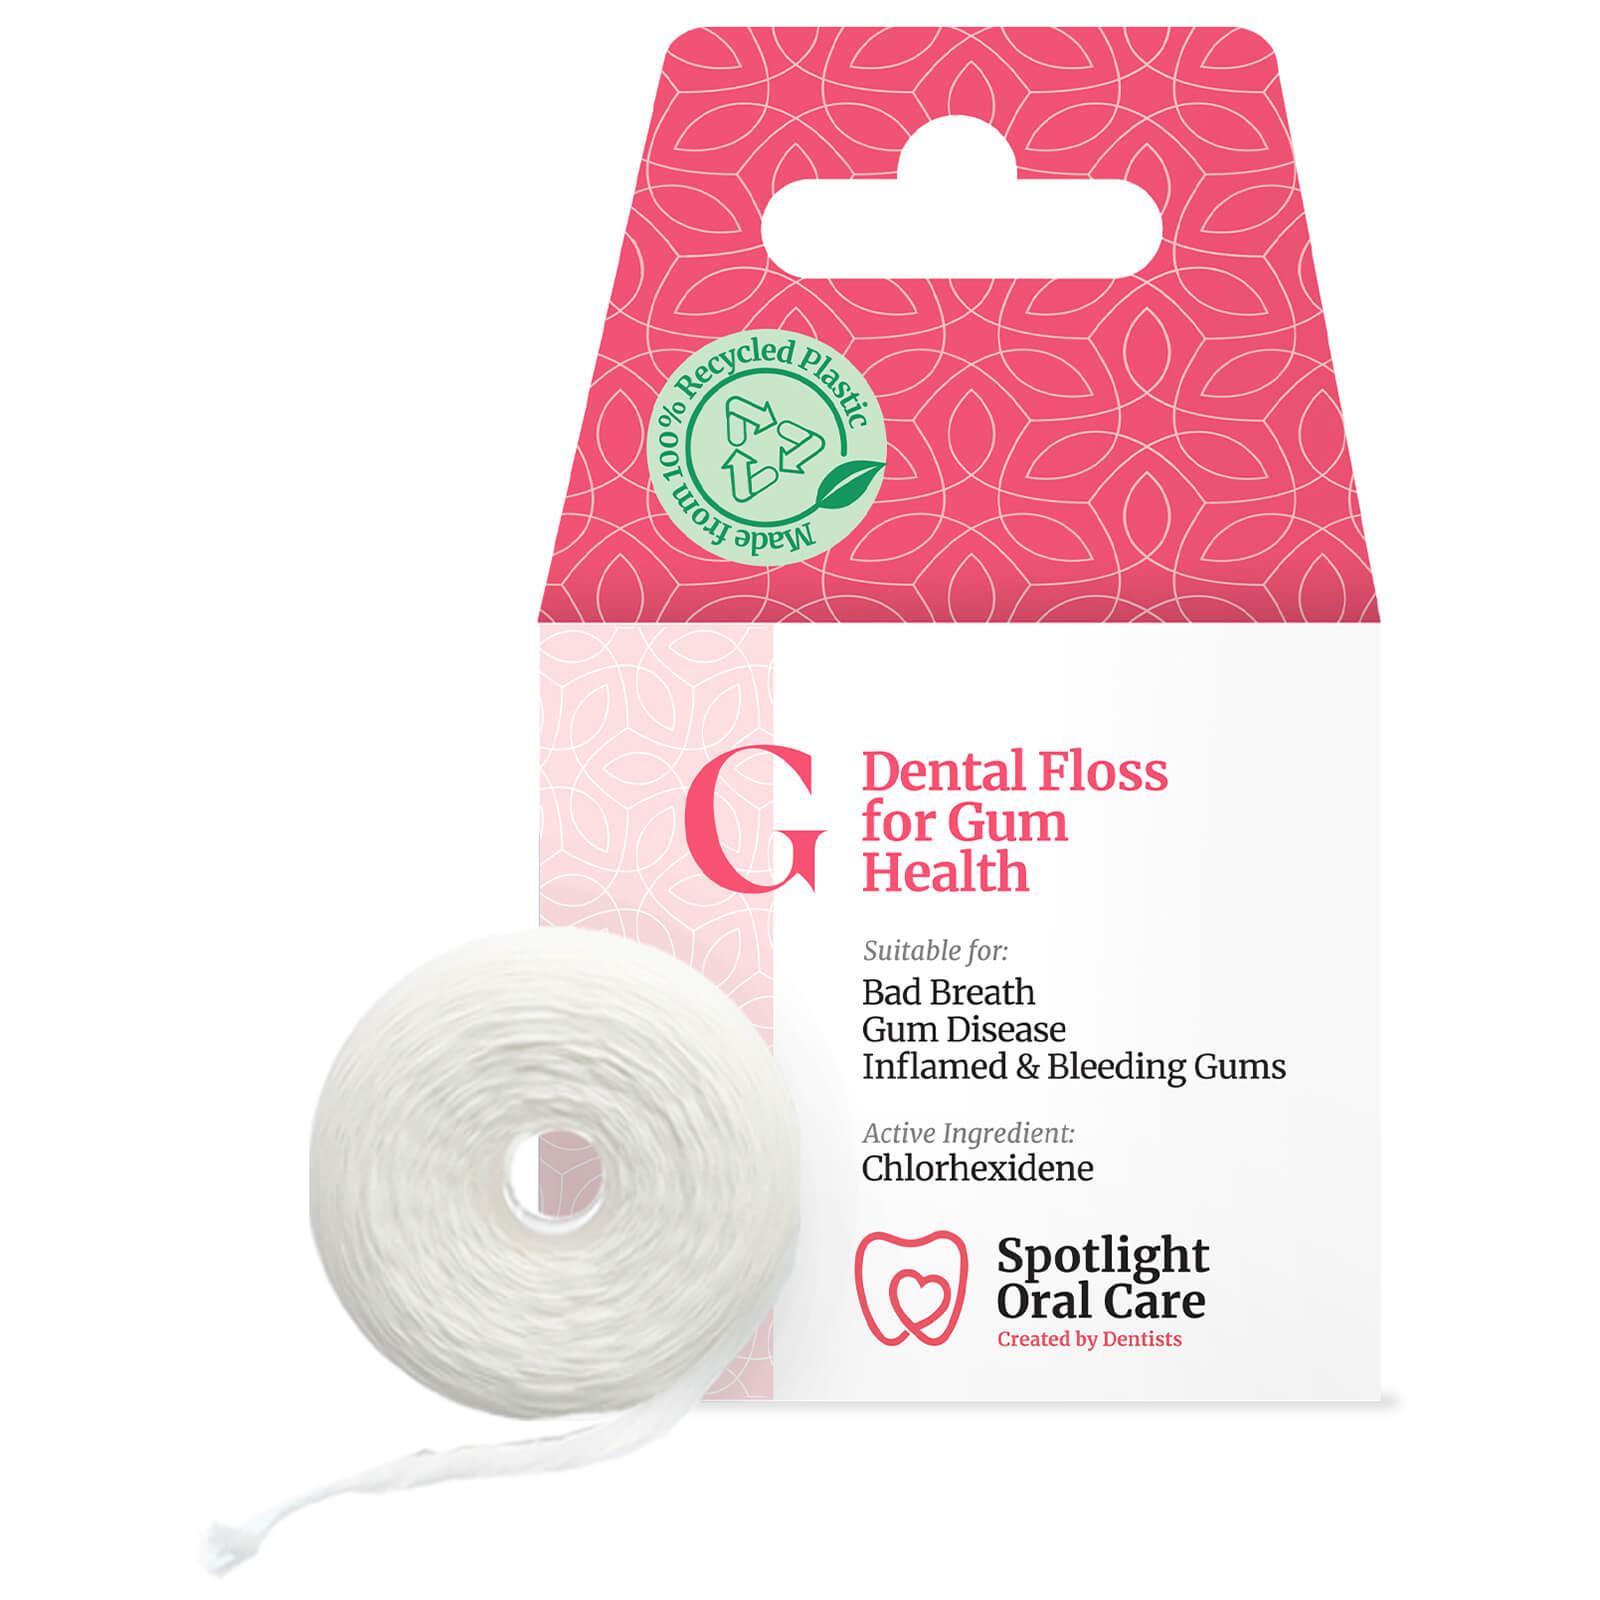 Spotlight Oral Care Dental Floss for Gum Health